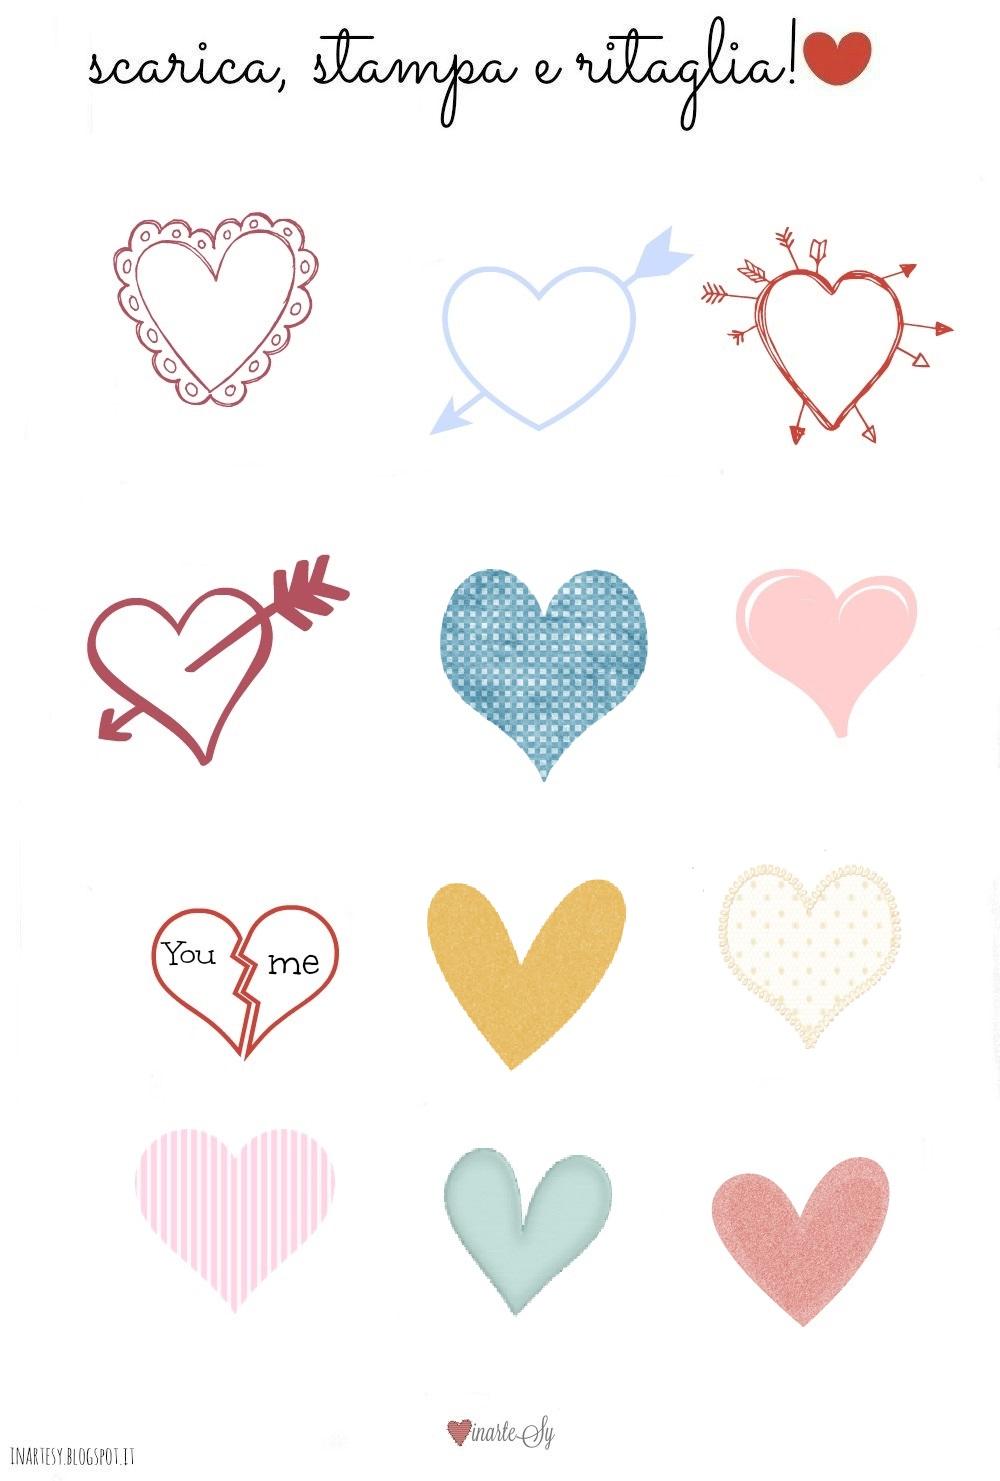 Favorito inartesy- Handmade, Food, Graphics, Lifestyle: ♡ Stickers cuori  JF46